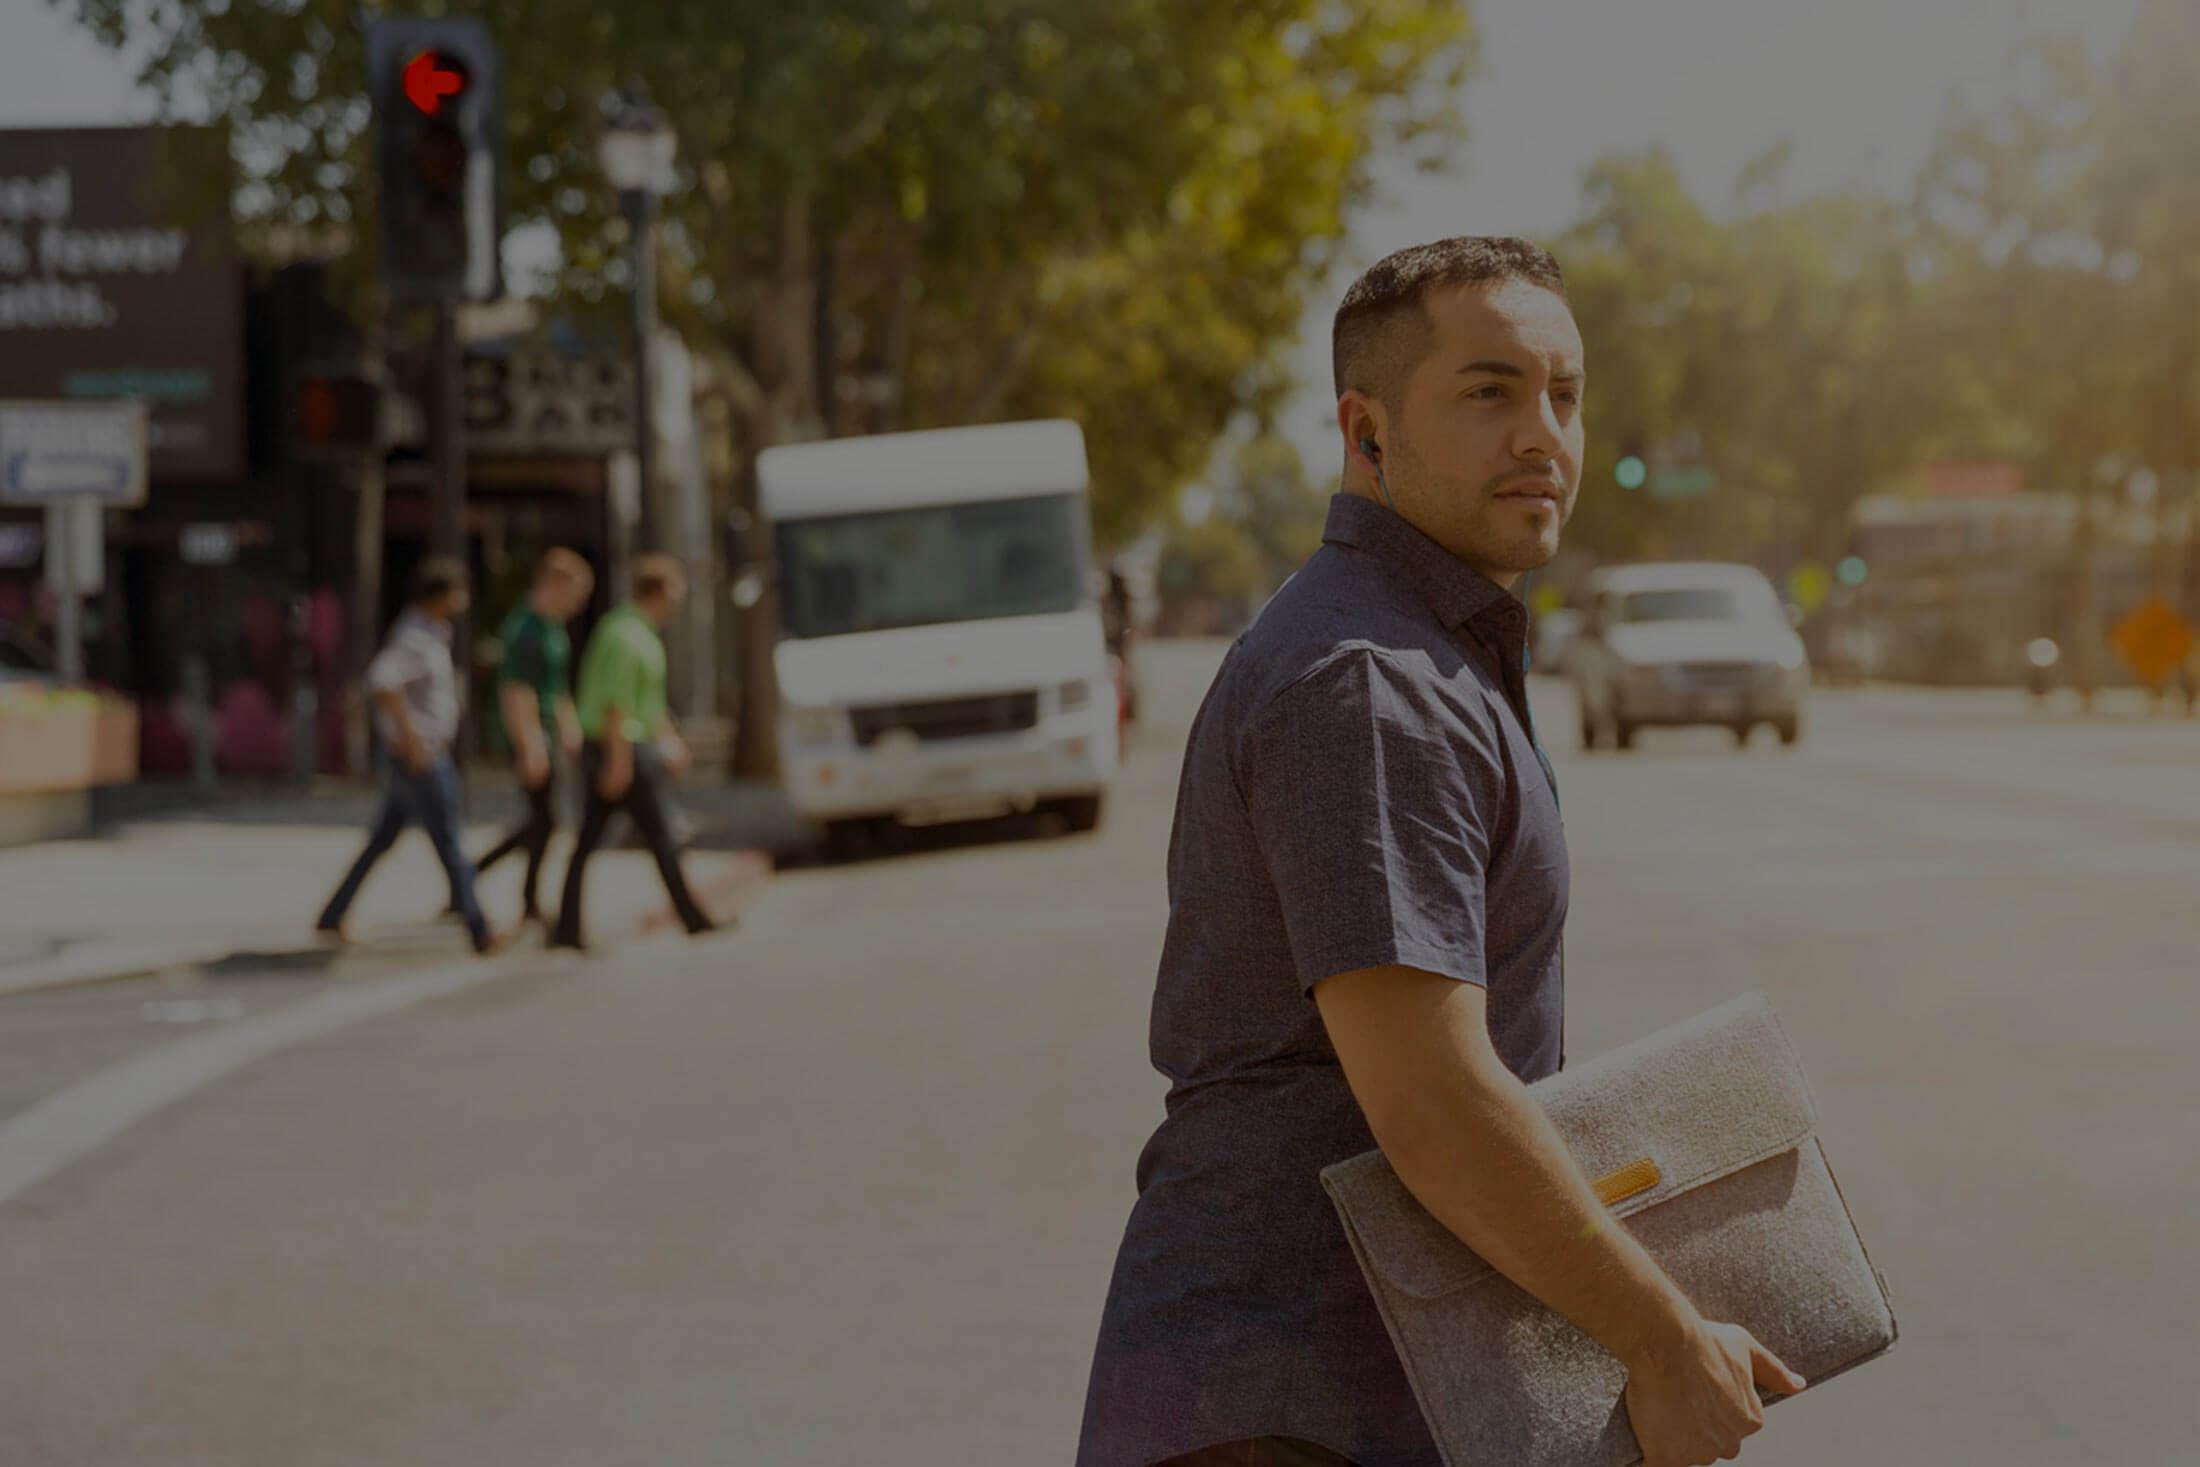 Pole emploi - offre emploi Chef d'equipe industriel (H/F) - Bassens